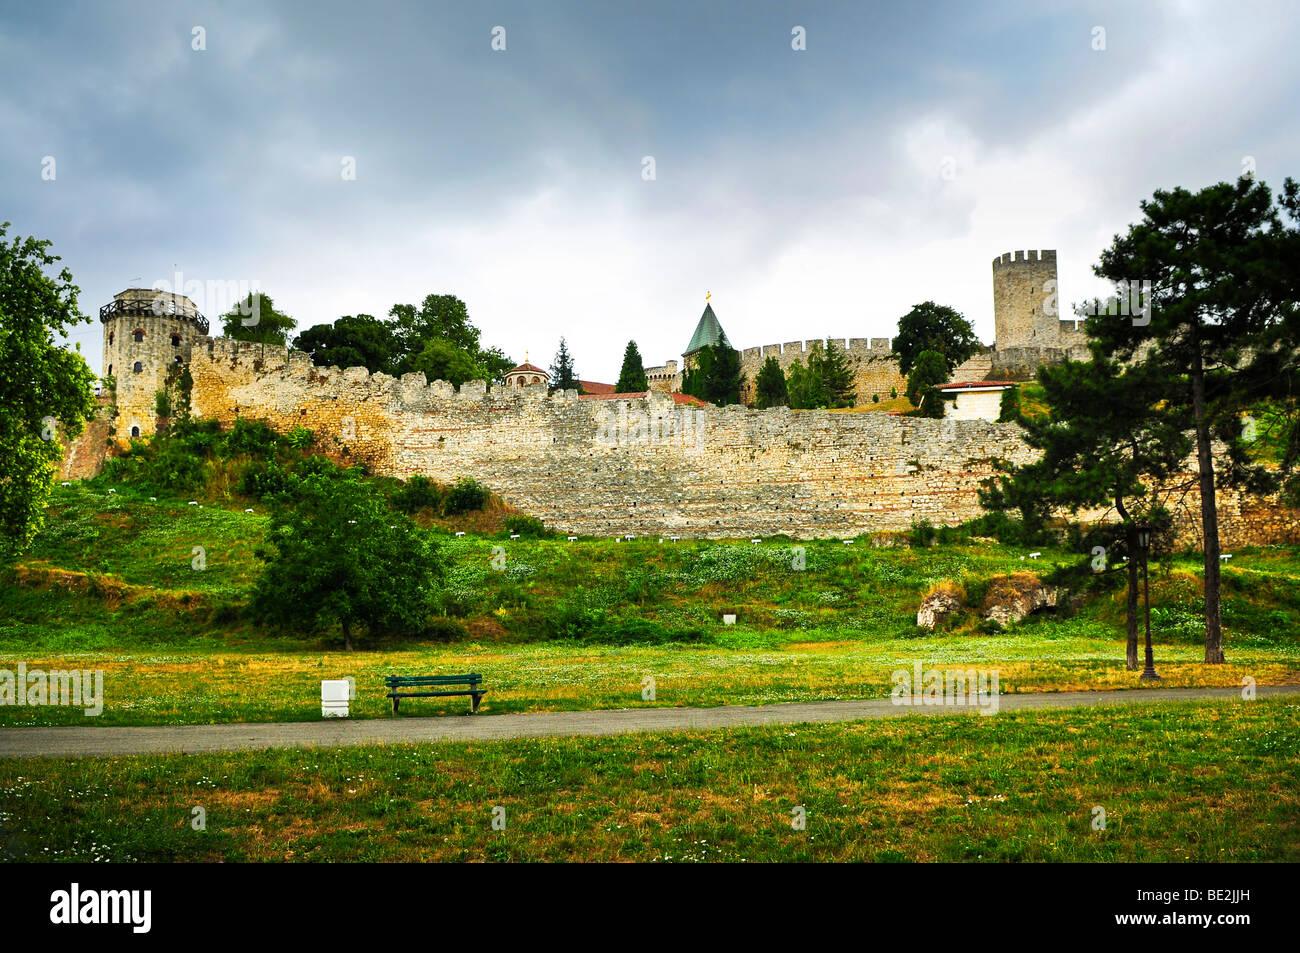 Kalemegdan fortress in Belgrade with walking path - Stock Image